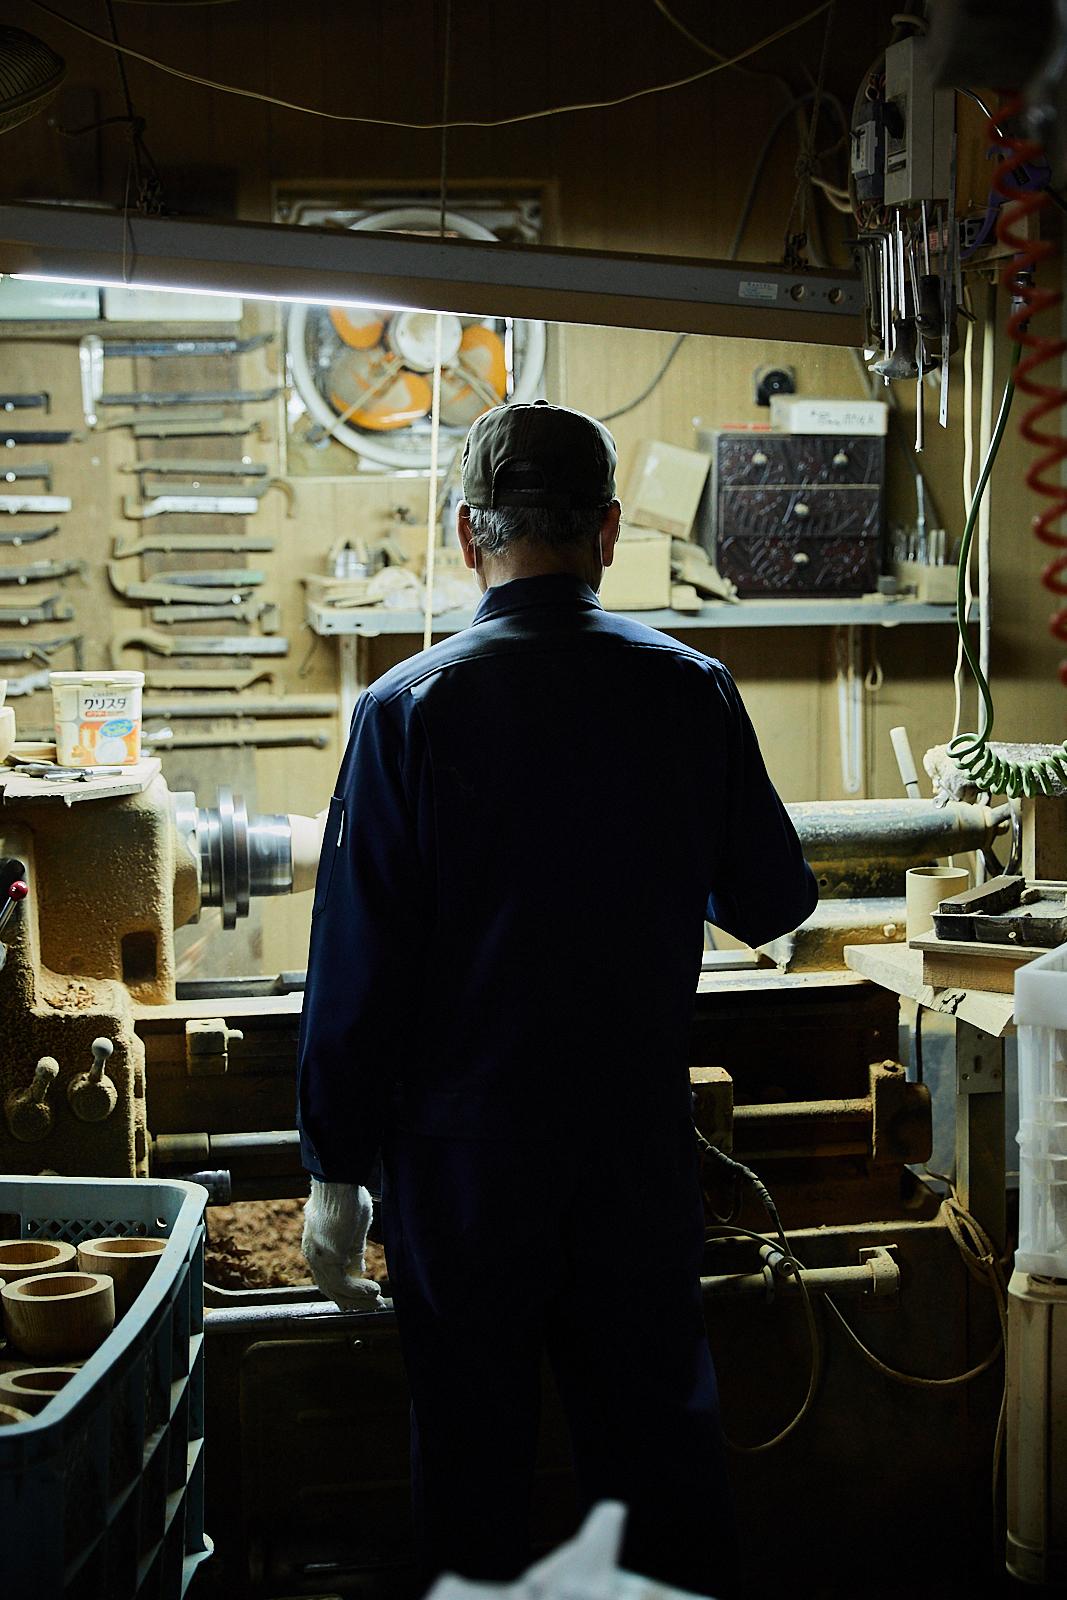 woodworking factory - 36.jpg